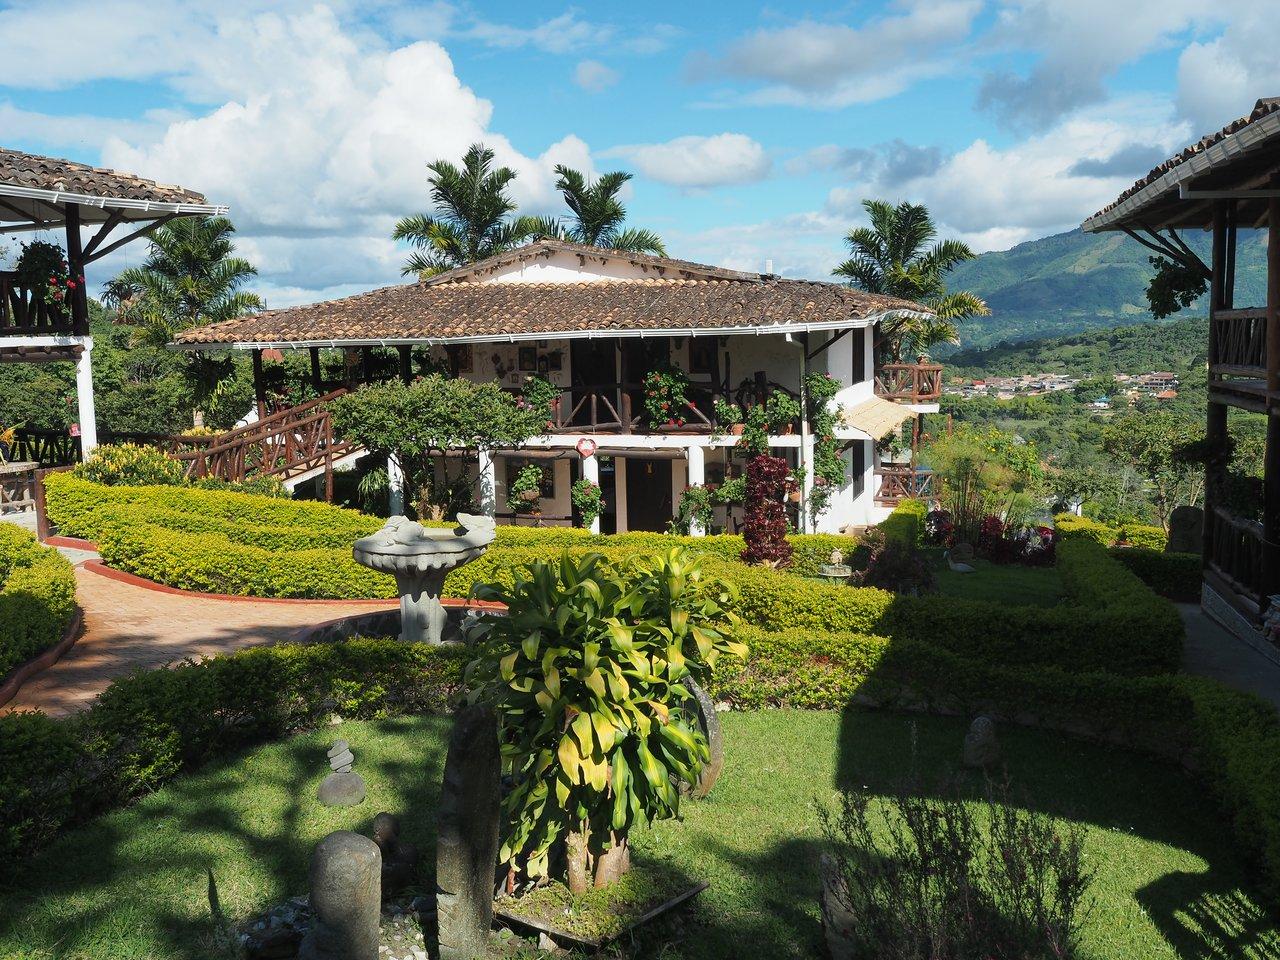 Akawanka Hotel San Agustin | Photo taken by Peter G